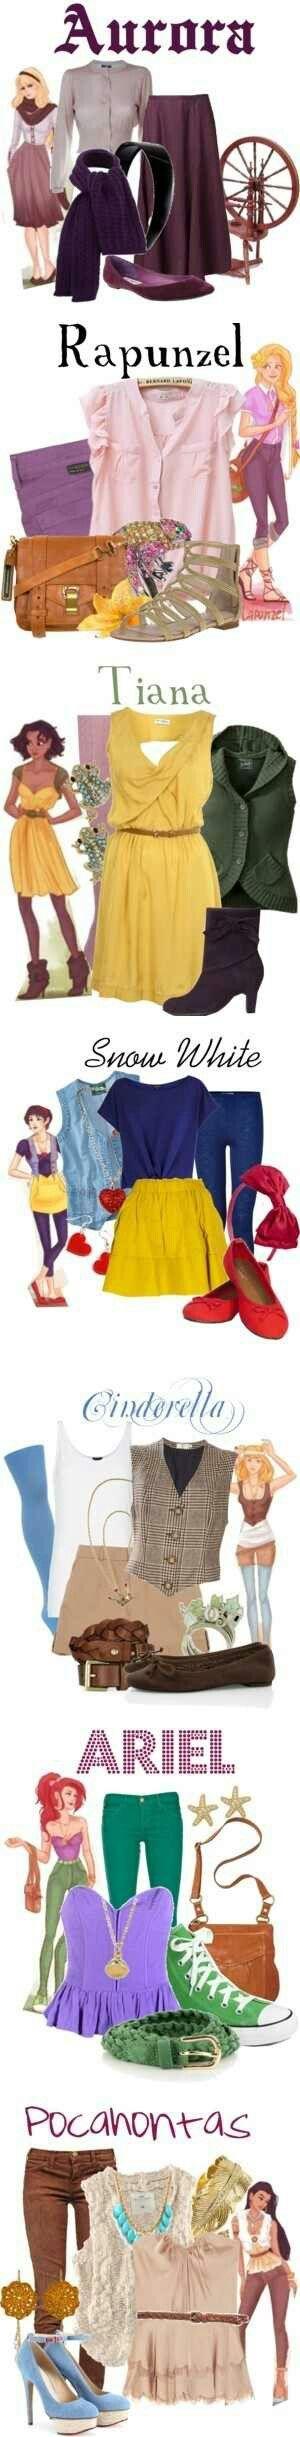 Disney Prinzessinnen Outfit's